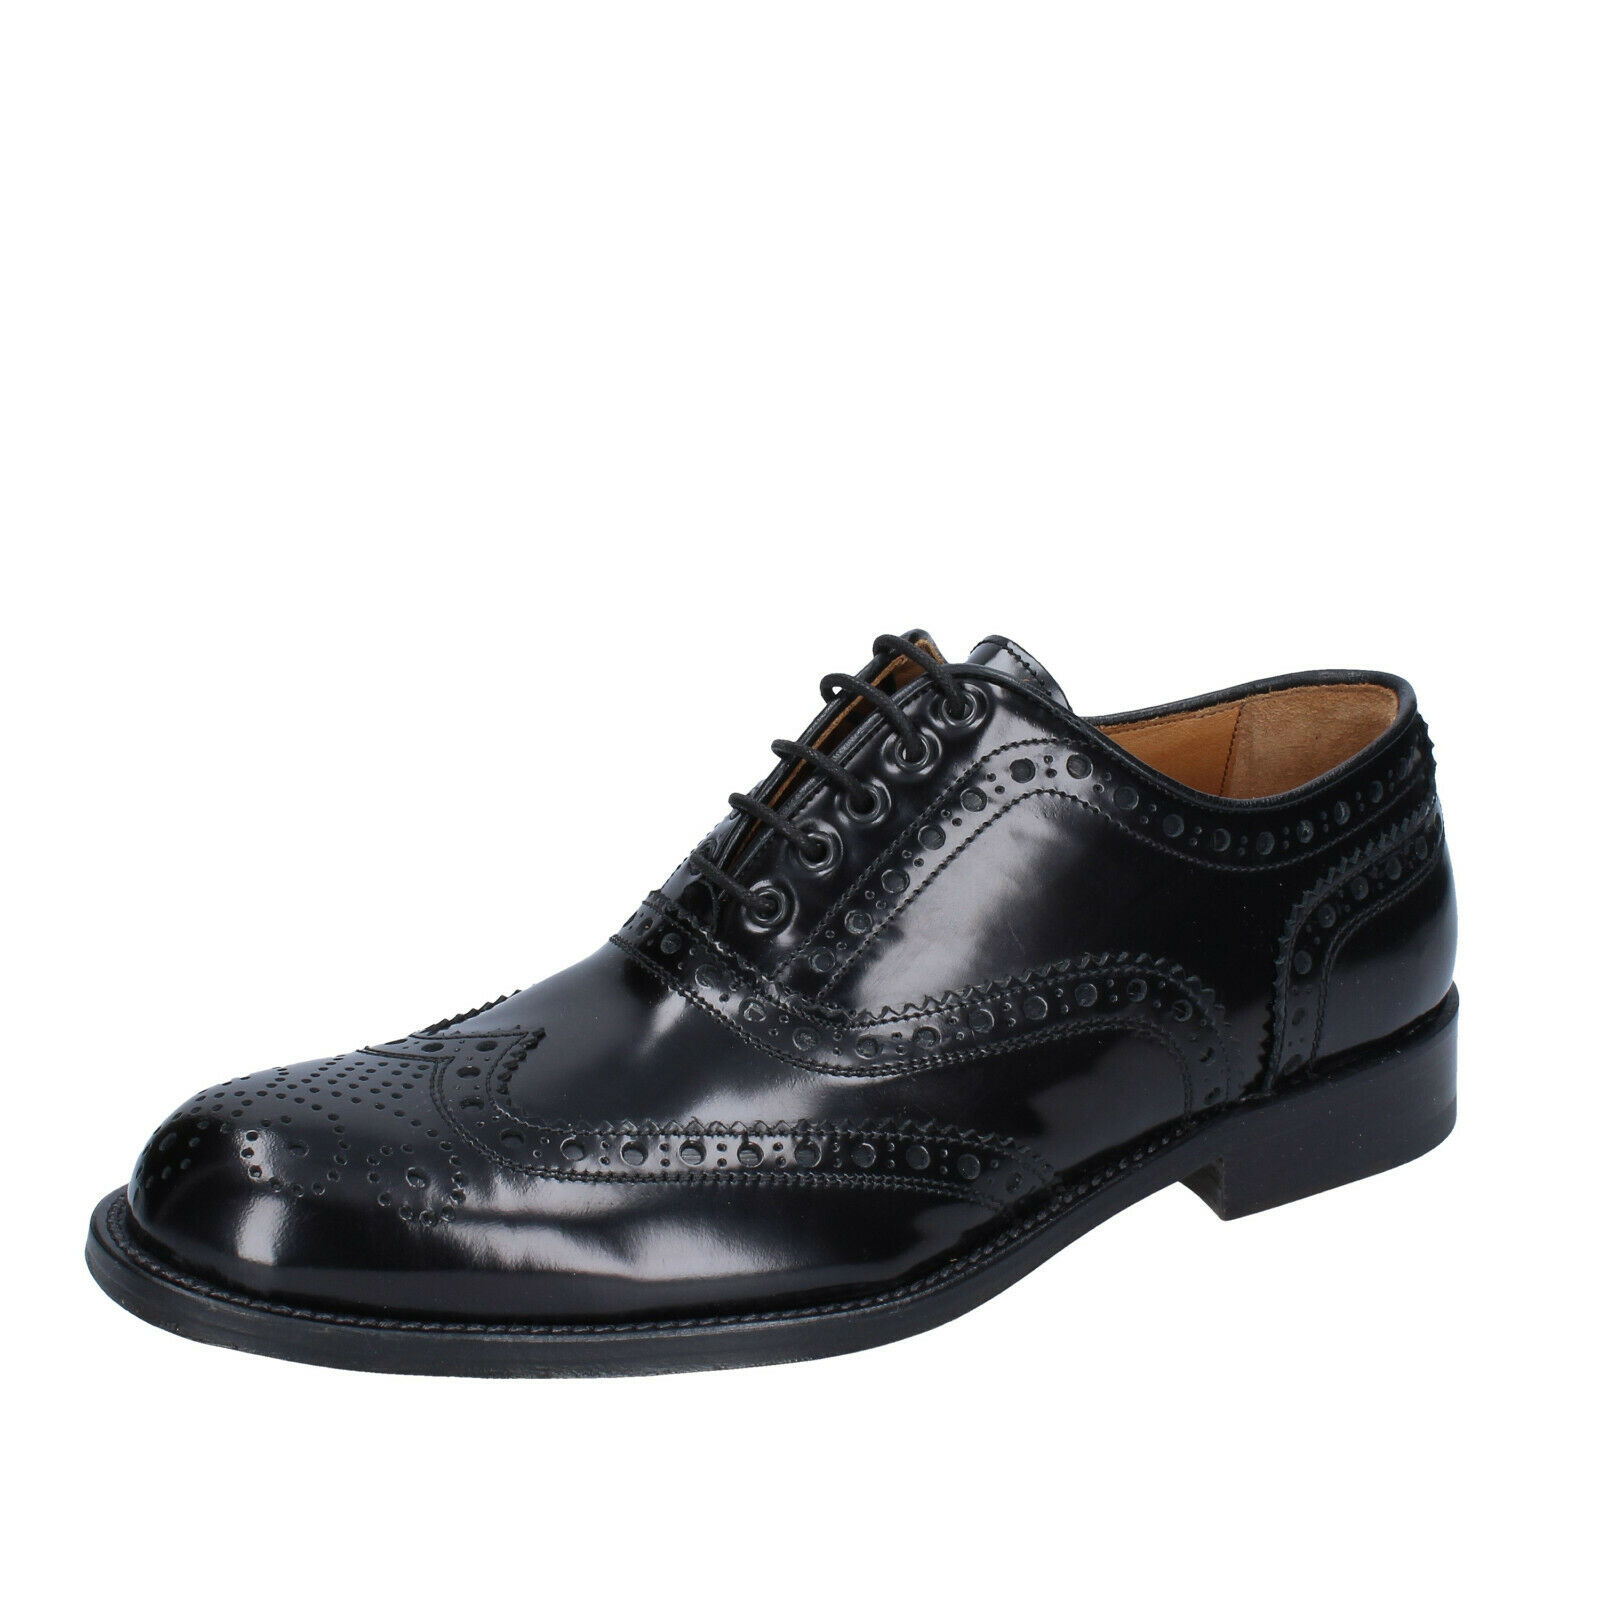 Mens schuhe ALEXANDER 8 (EU 42) elegant elegant elegant schwarz shiny leather BS211-42 d80e0b